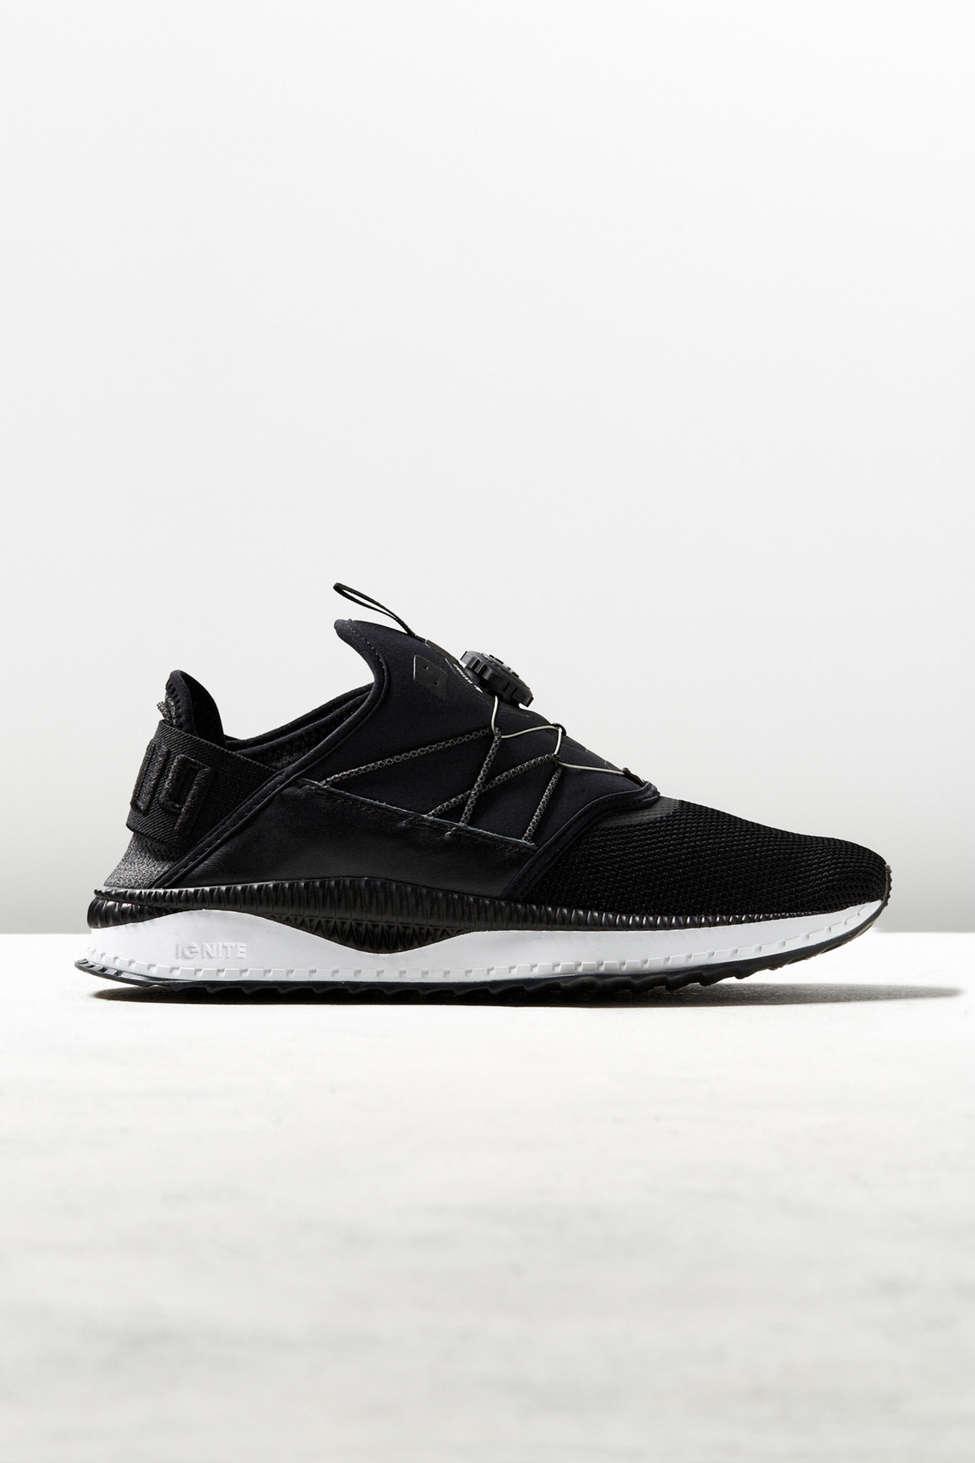 Puma Tsugi Disc sneakers